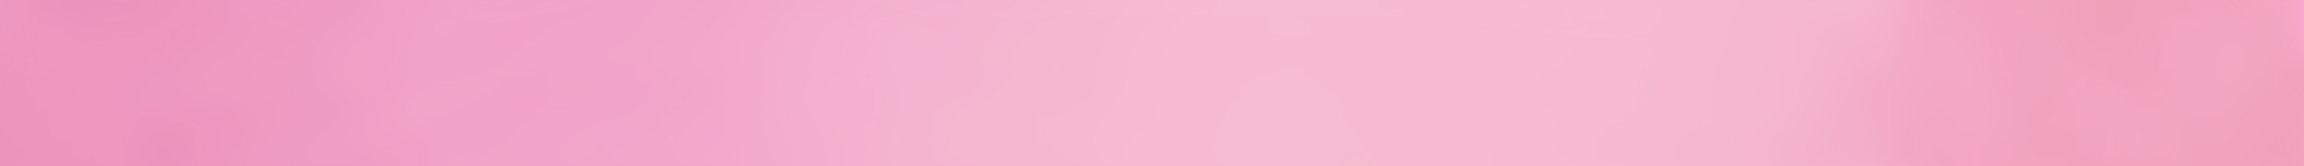 fond couleur menu.jpg